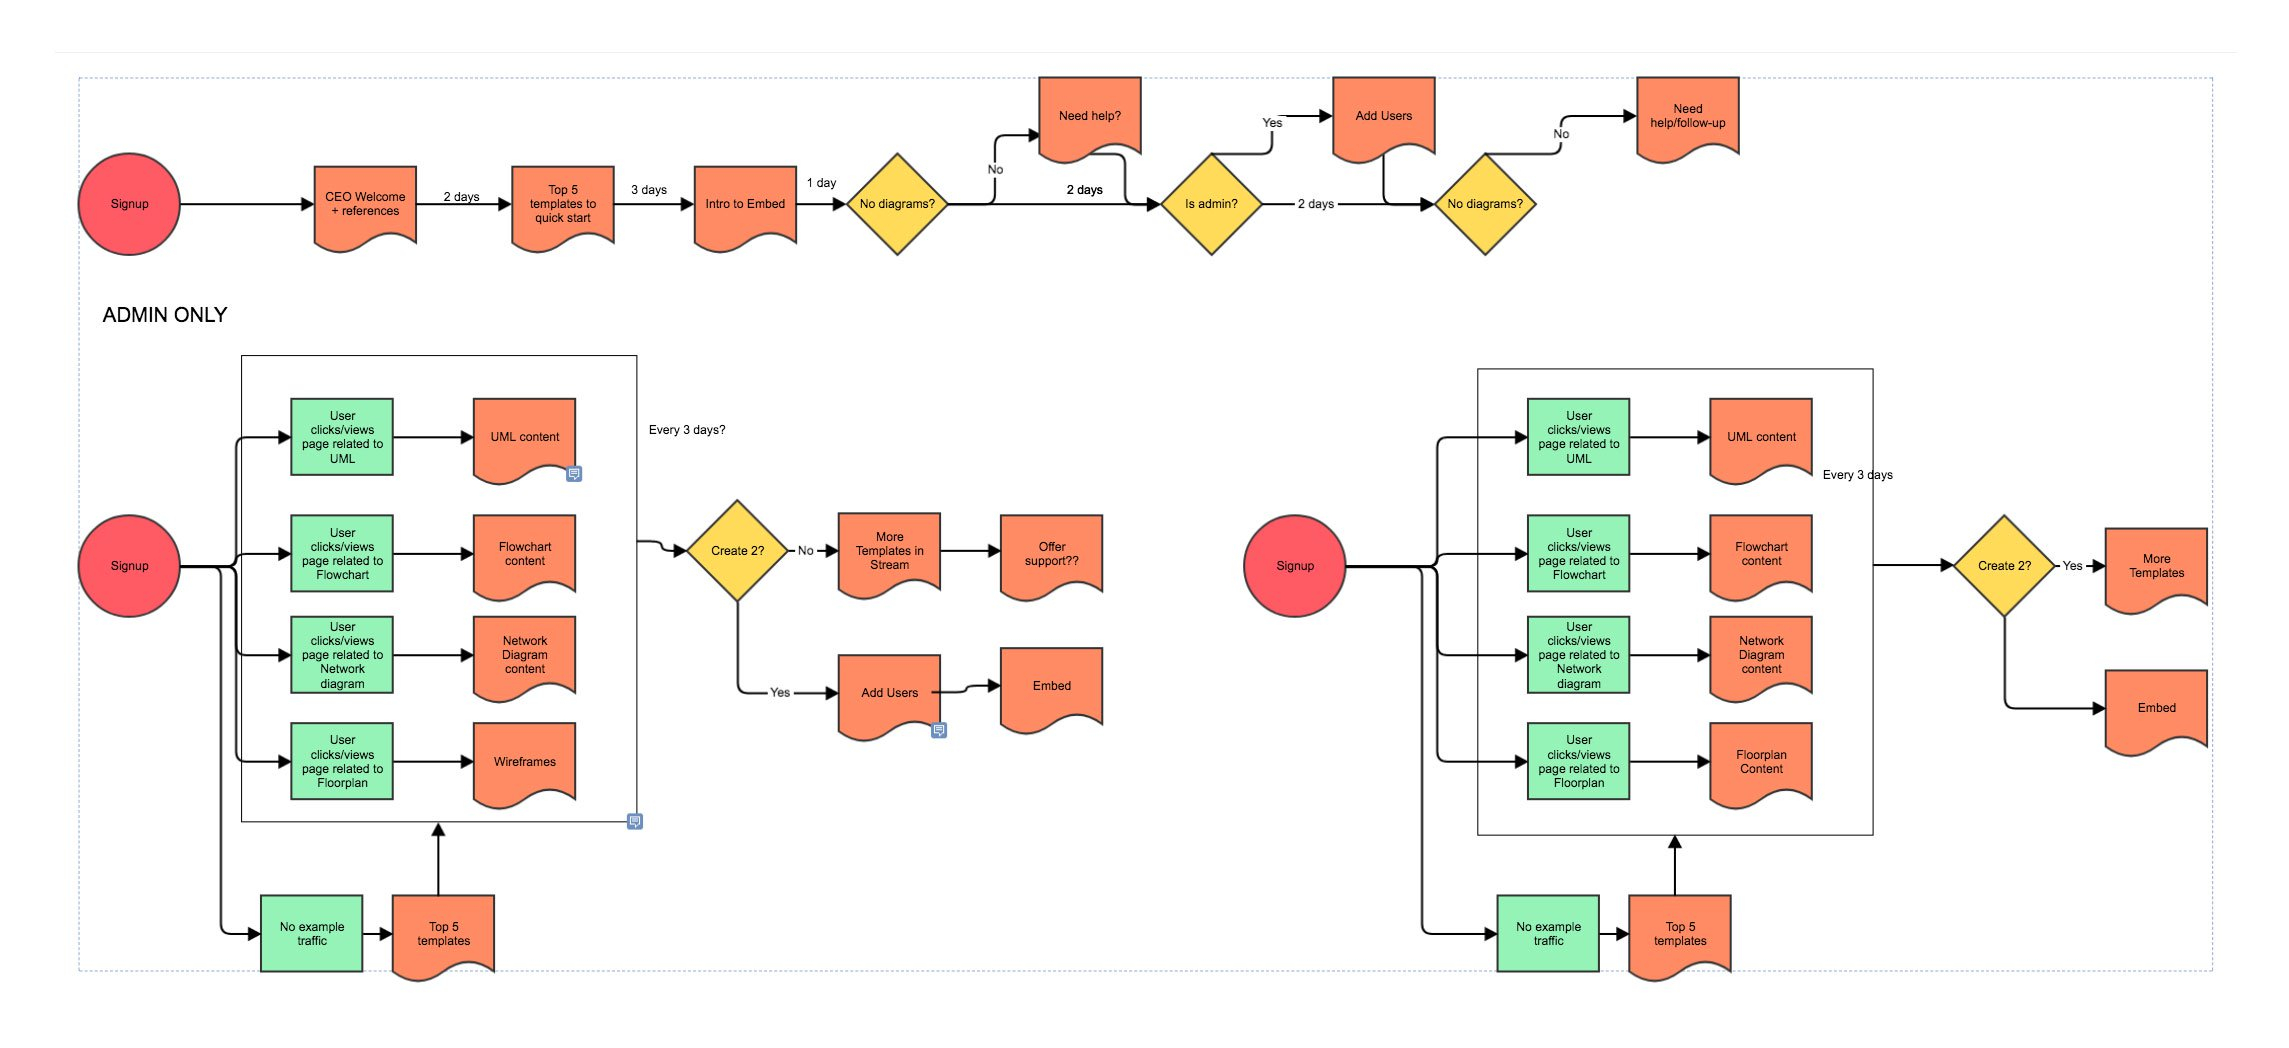 Tree Diagram Maker Flowchart Maker Fast Easy Flowchart Software Free Trial Gliffy